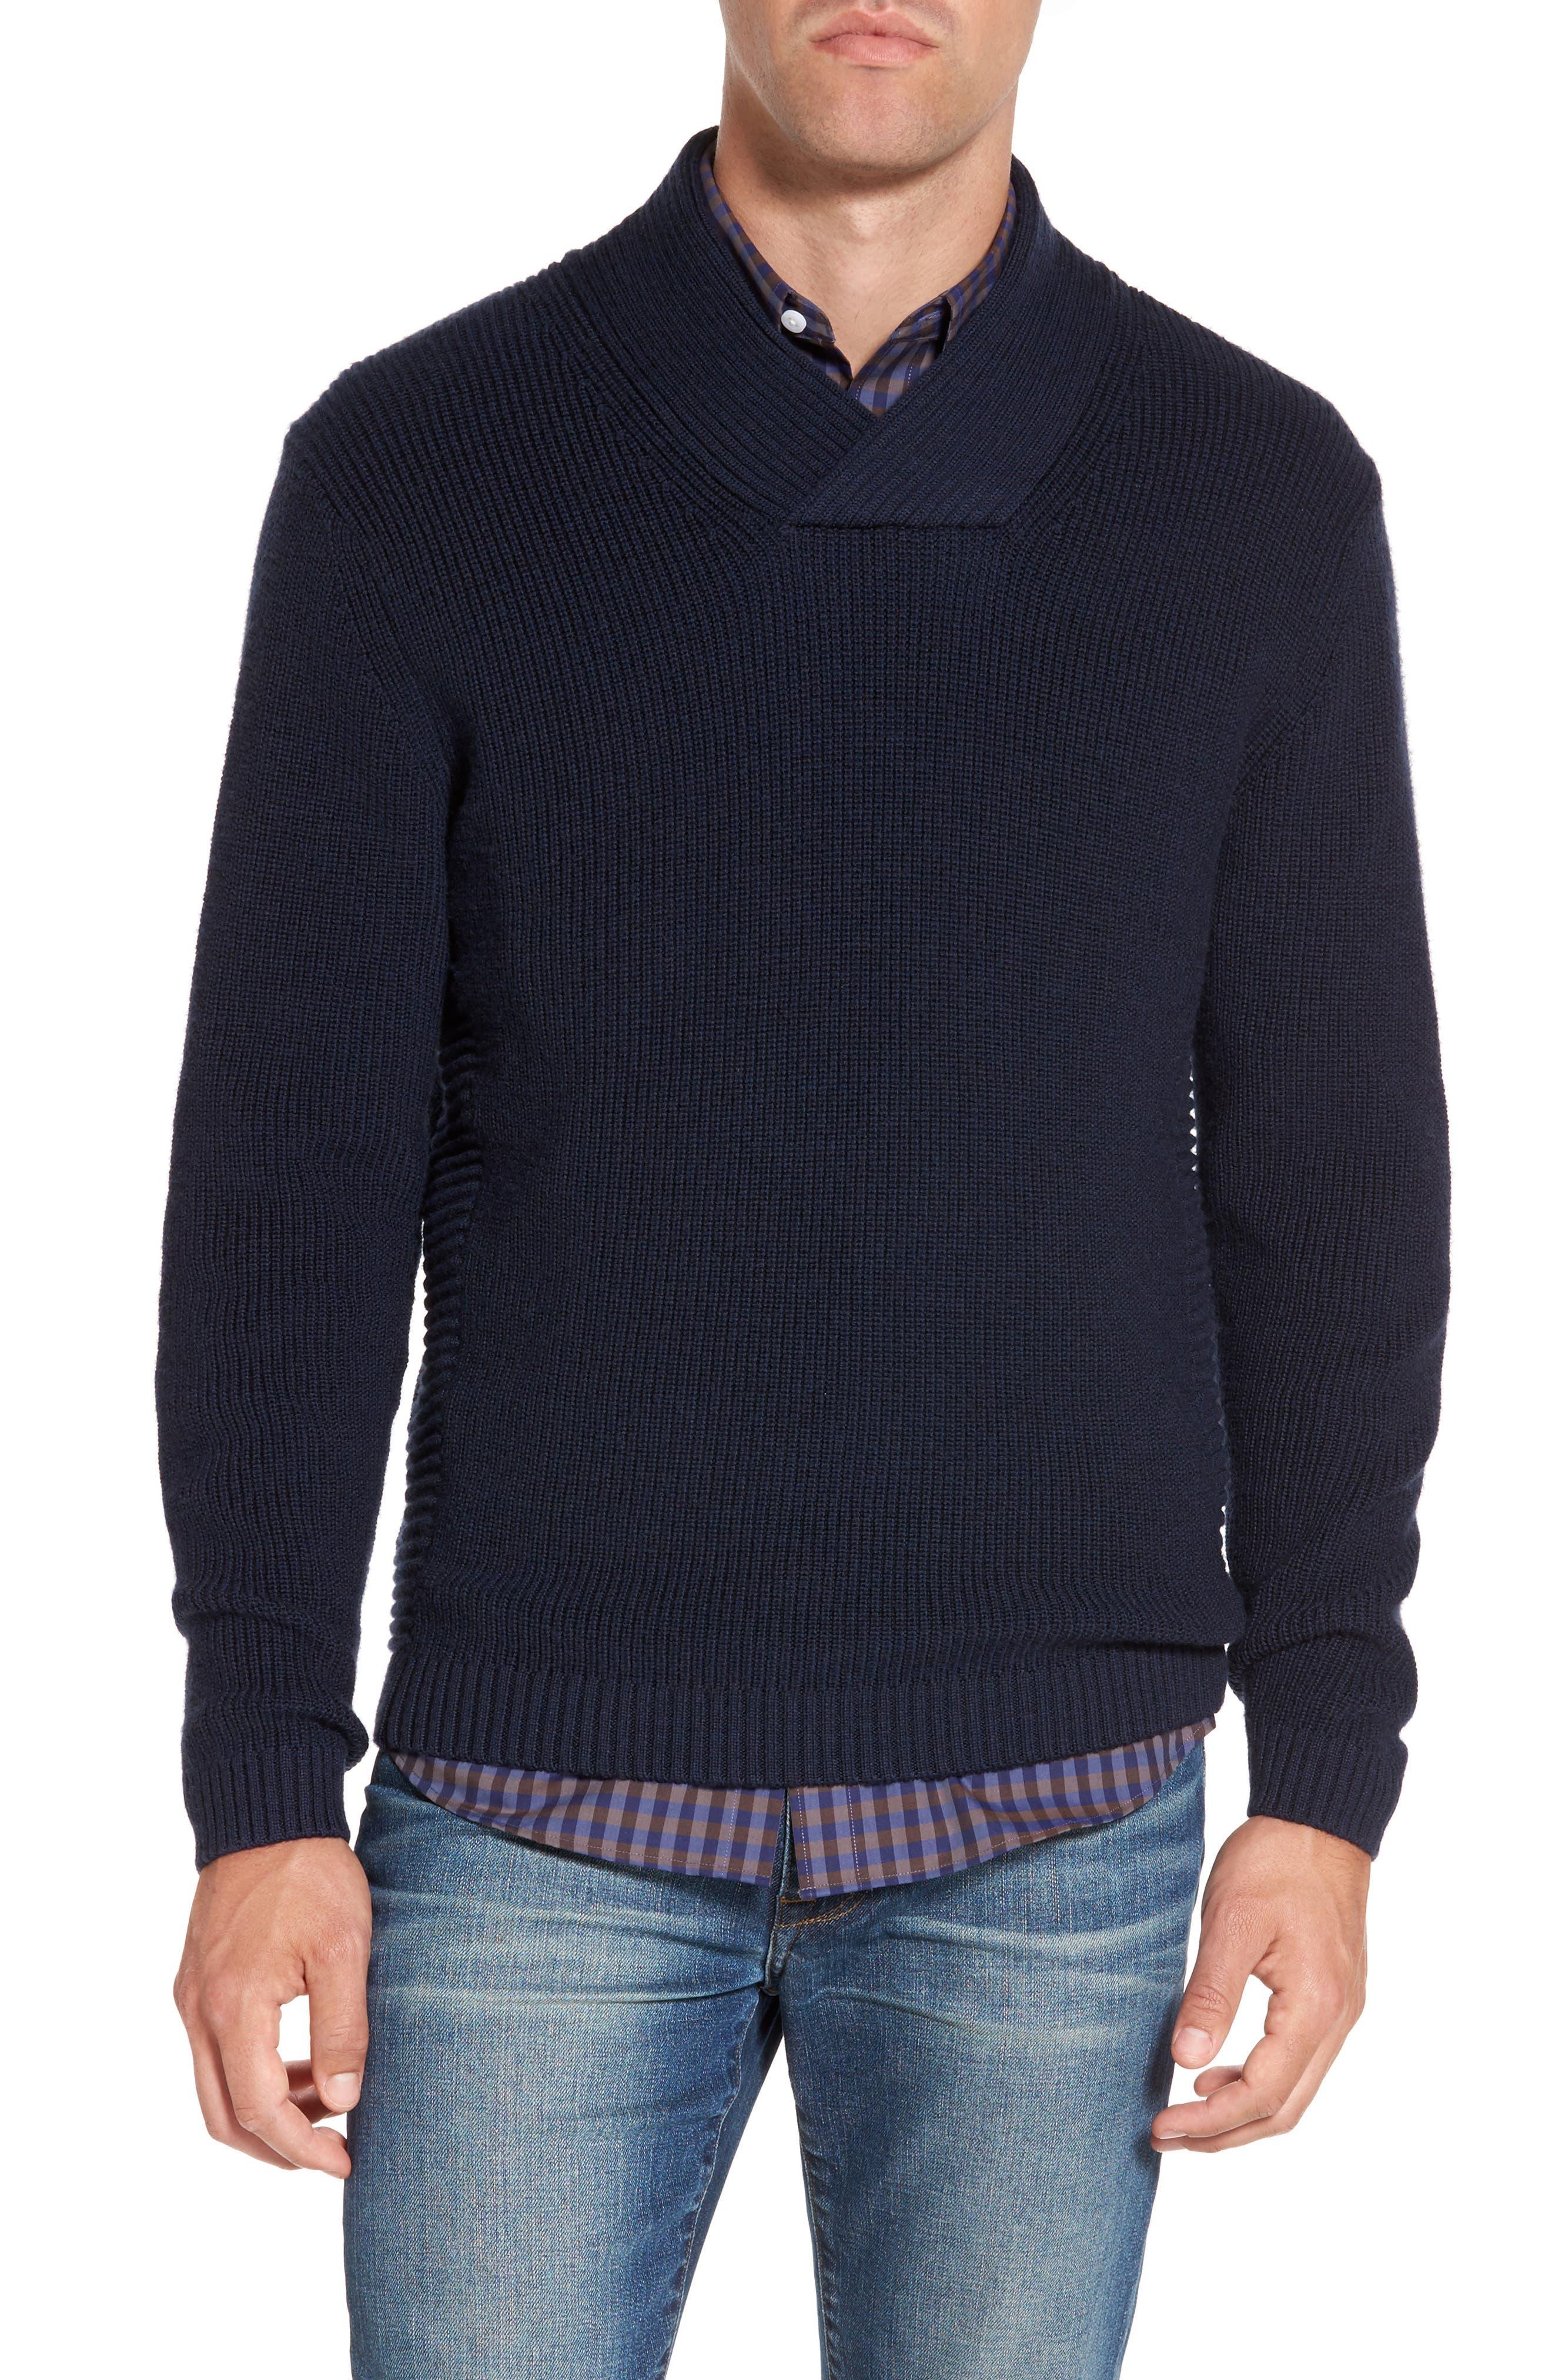 Rodd & Gunn Charlesworth Suede Patch Merino Wool Sweater